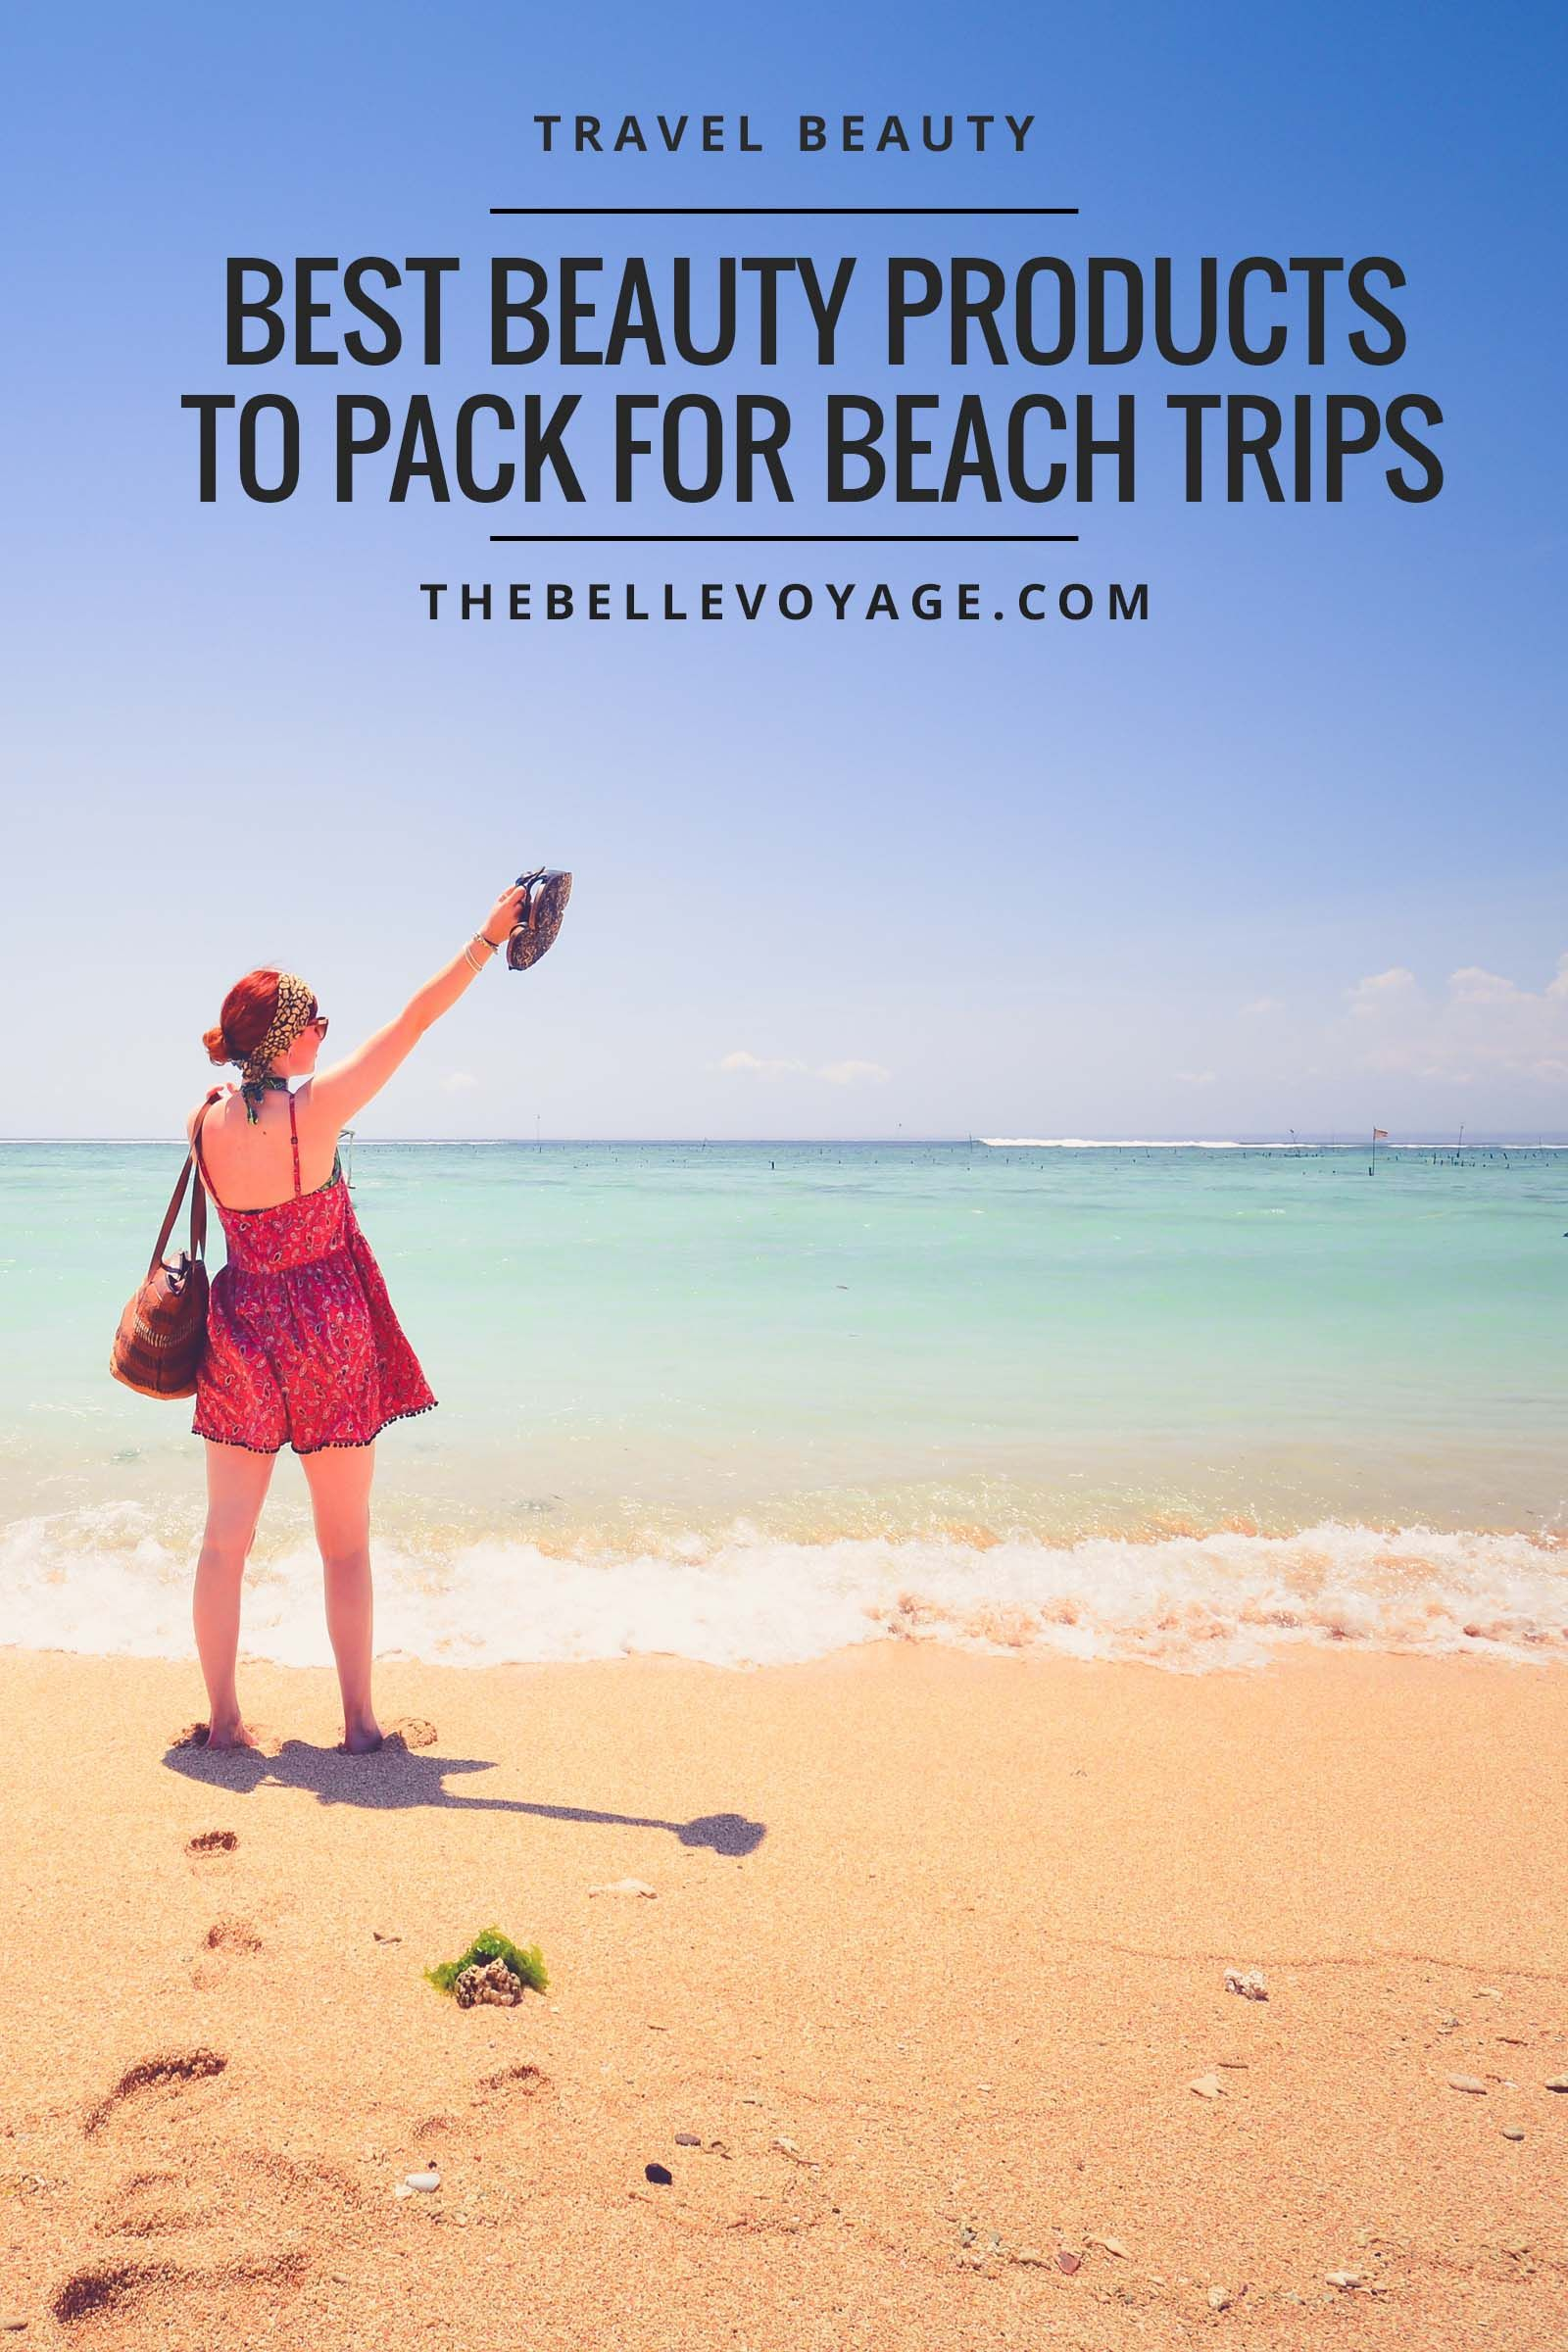 Beach Beauty Products: My Hawaii Makeup Bag  Travel beauty, Beach